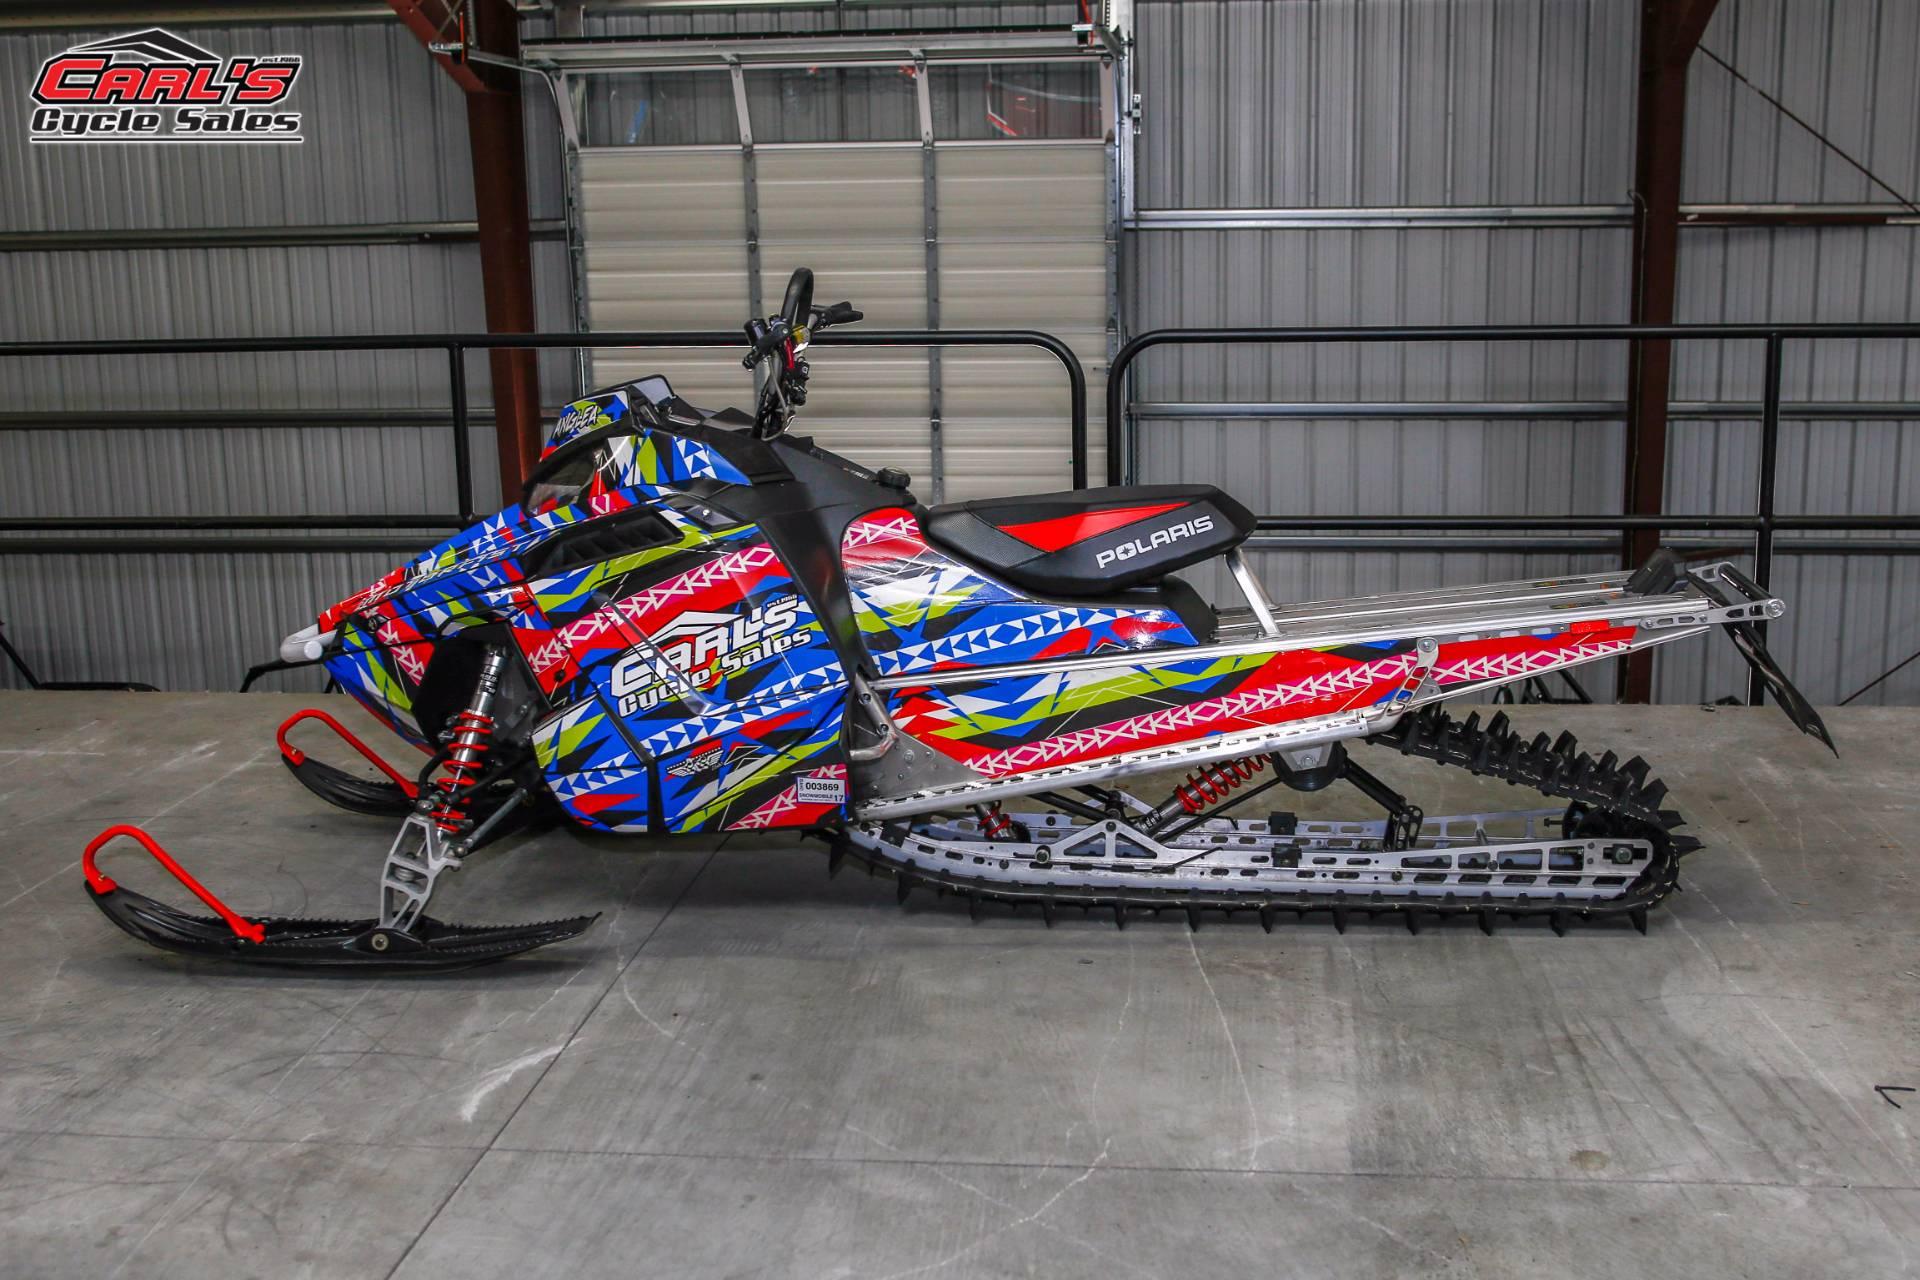 2015 800 Pro-RMK 155